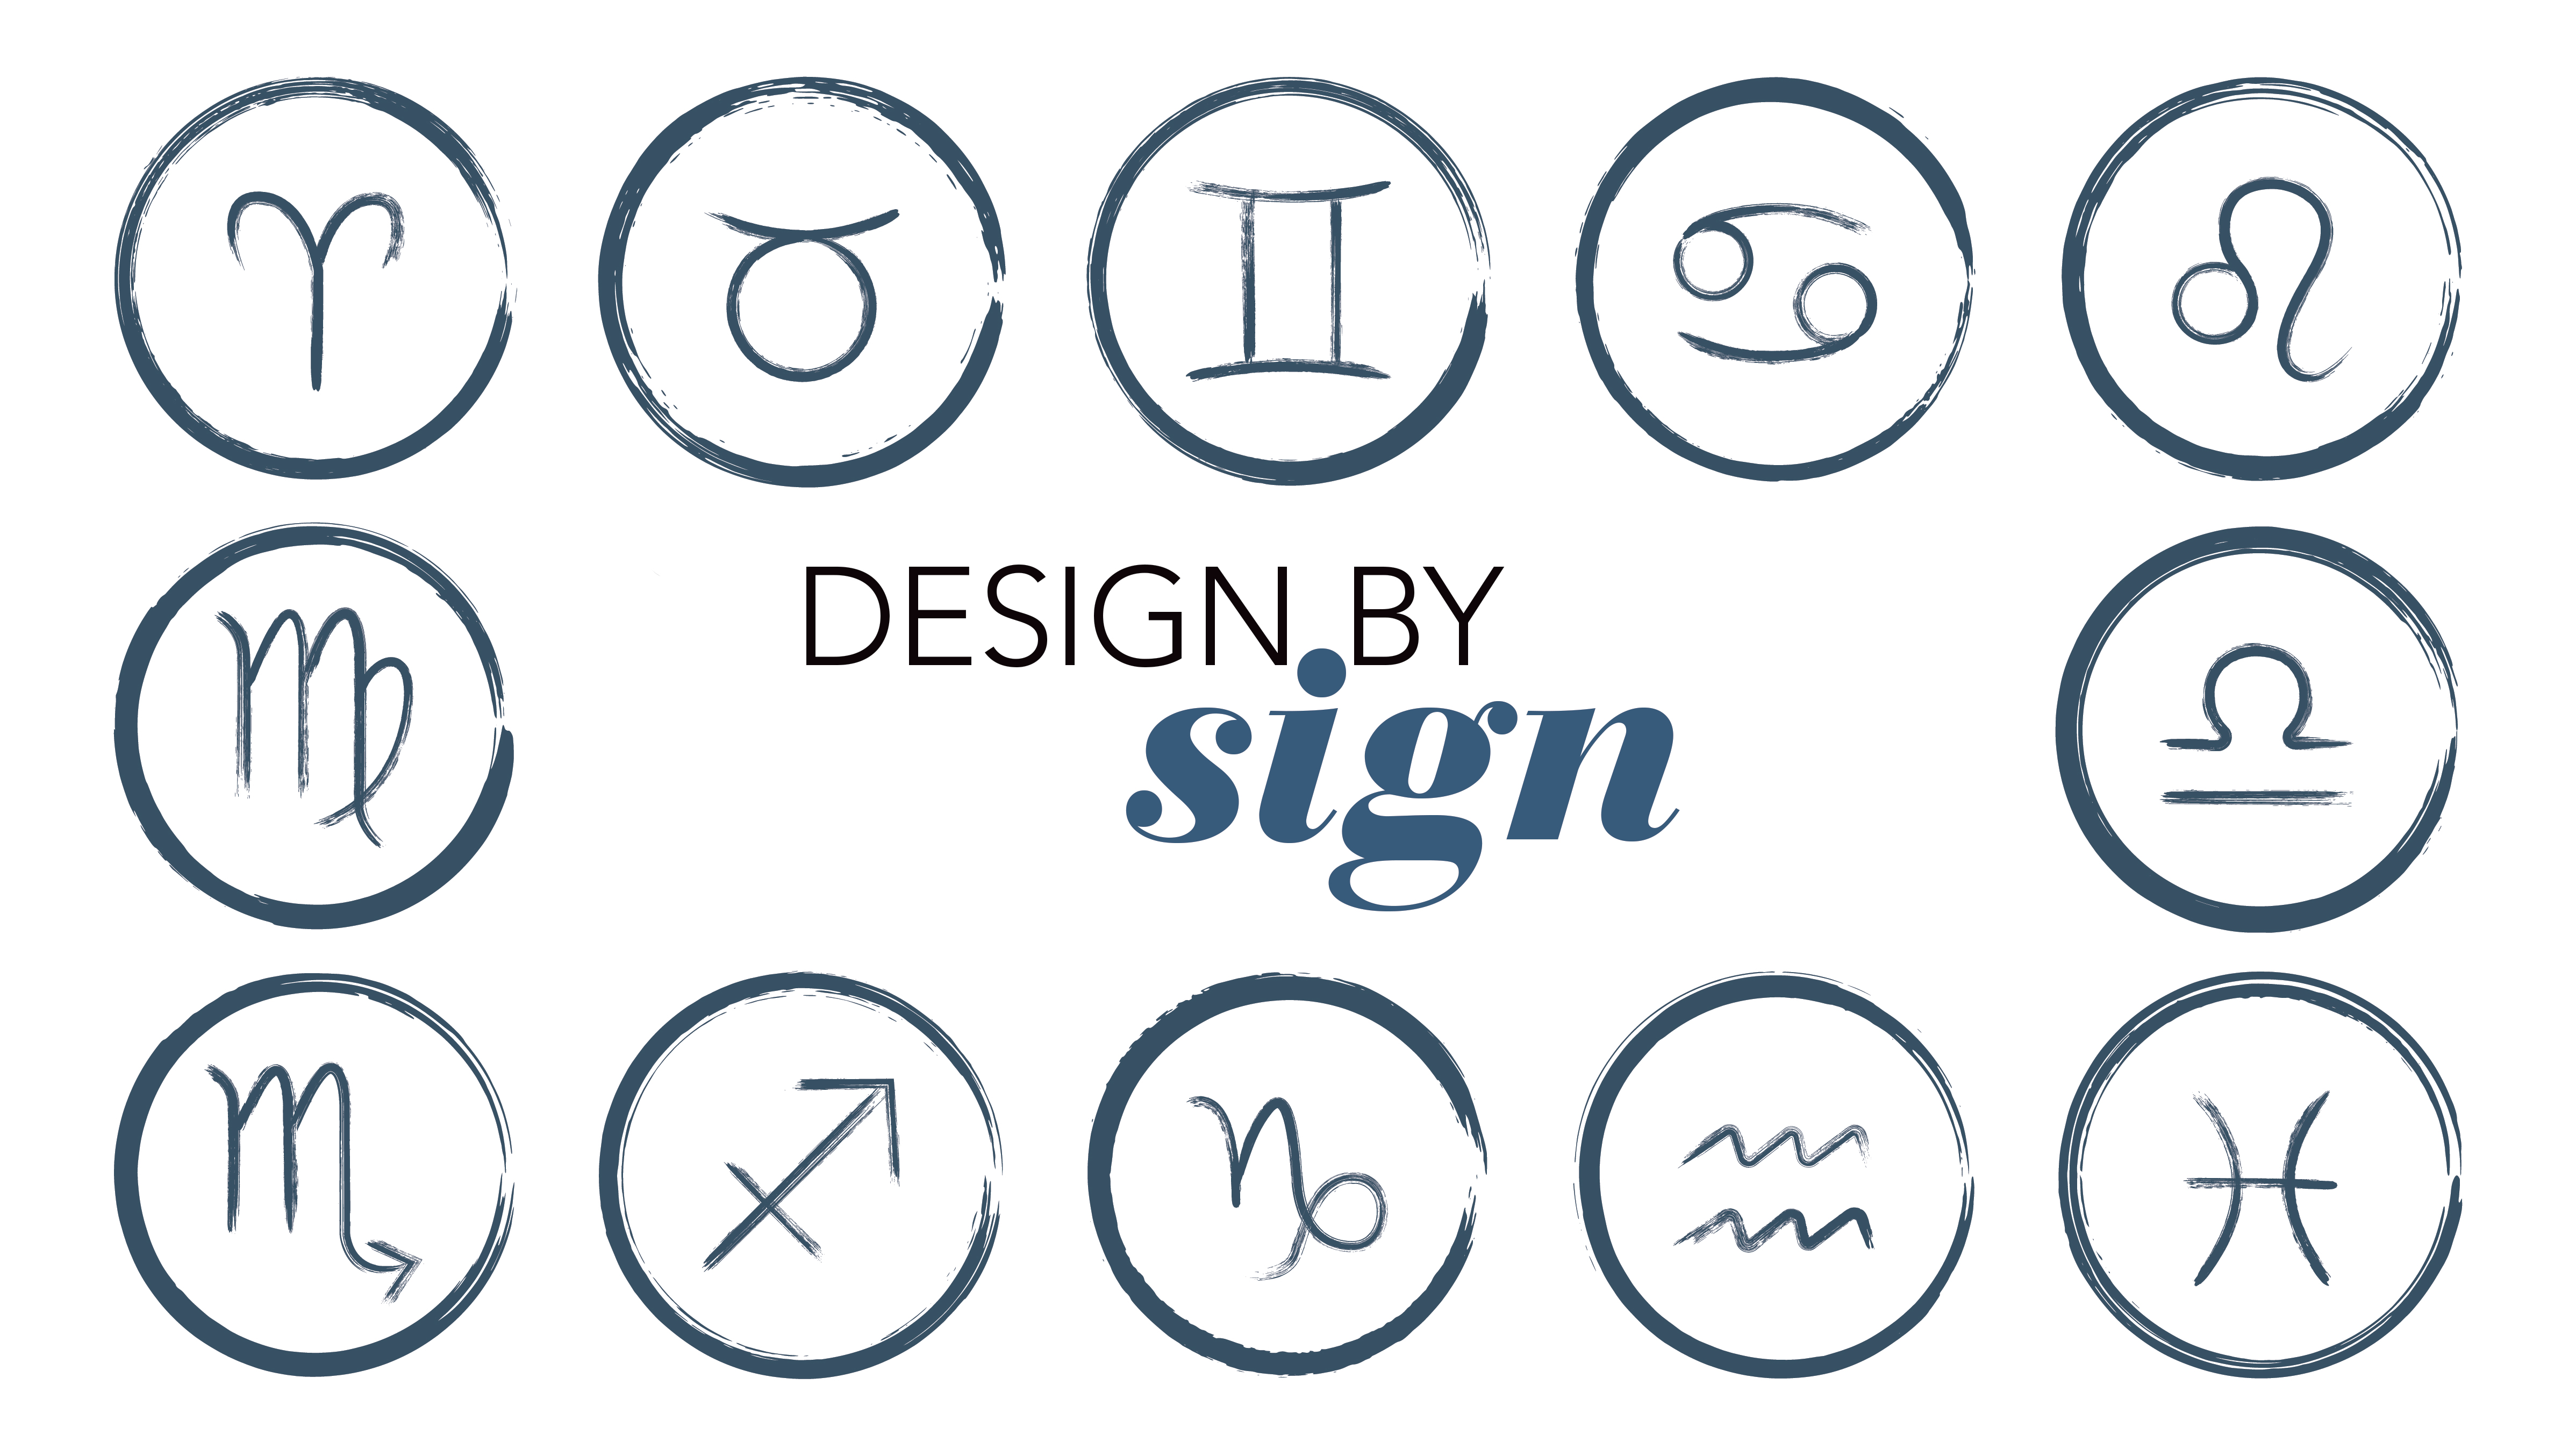 zodiac design by sign interior decor san diego home garden lifestyles magazine